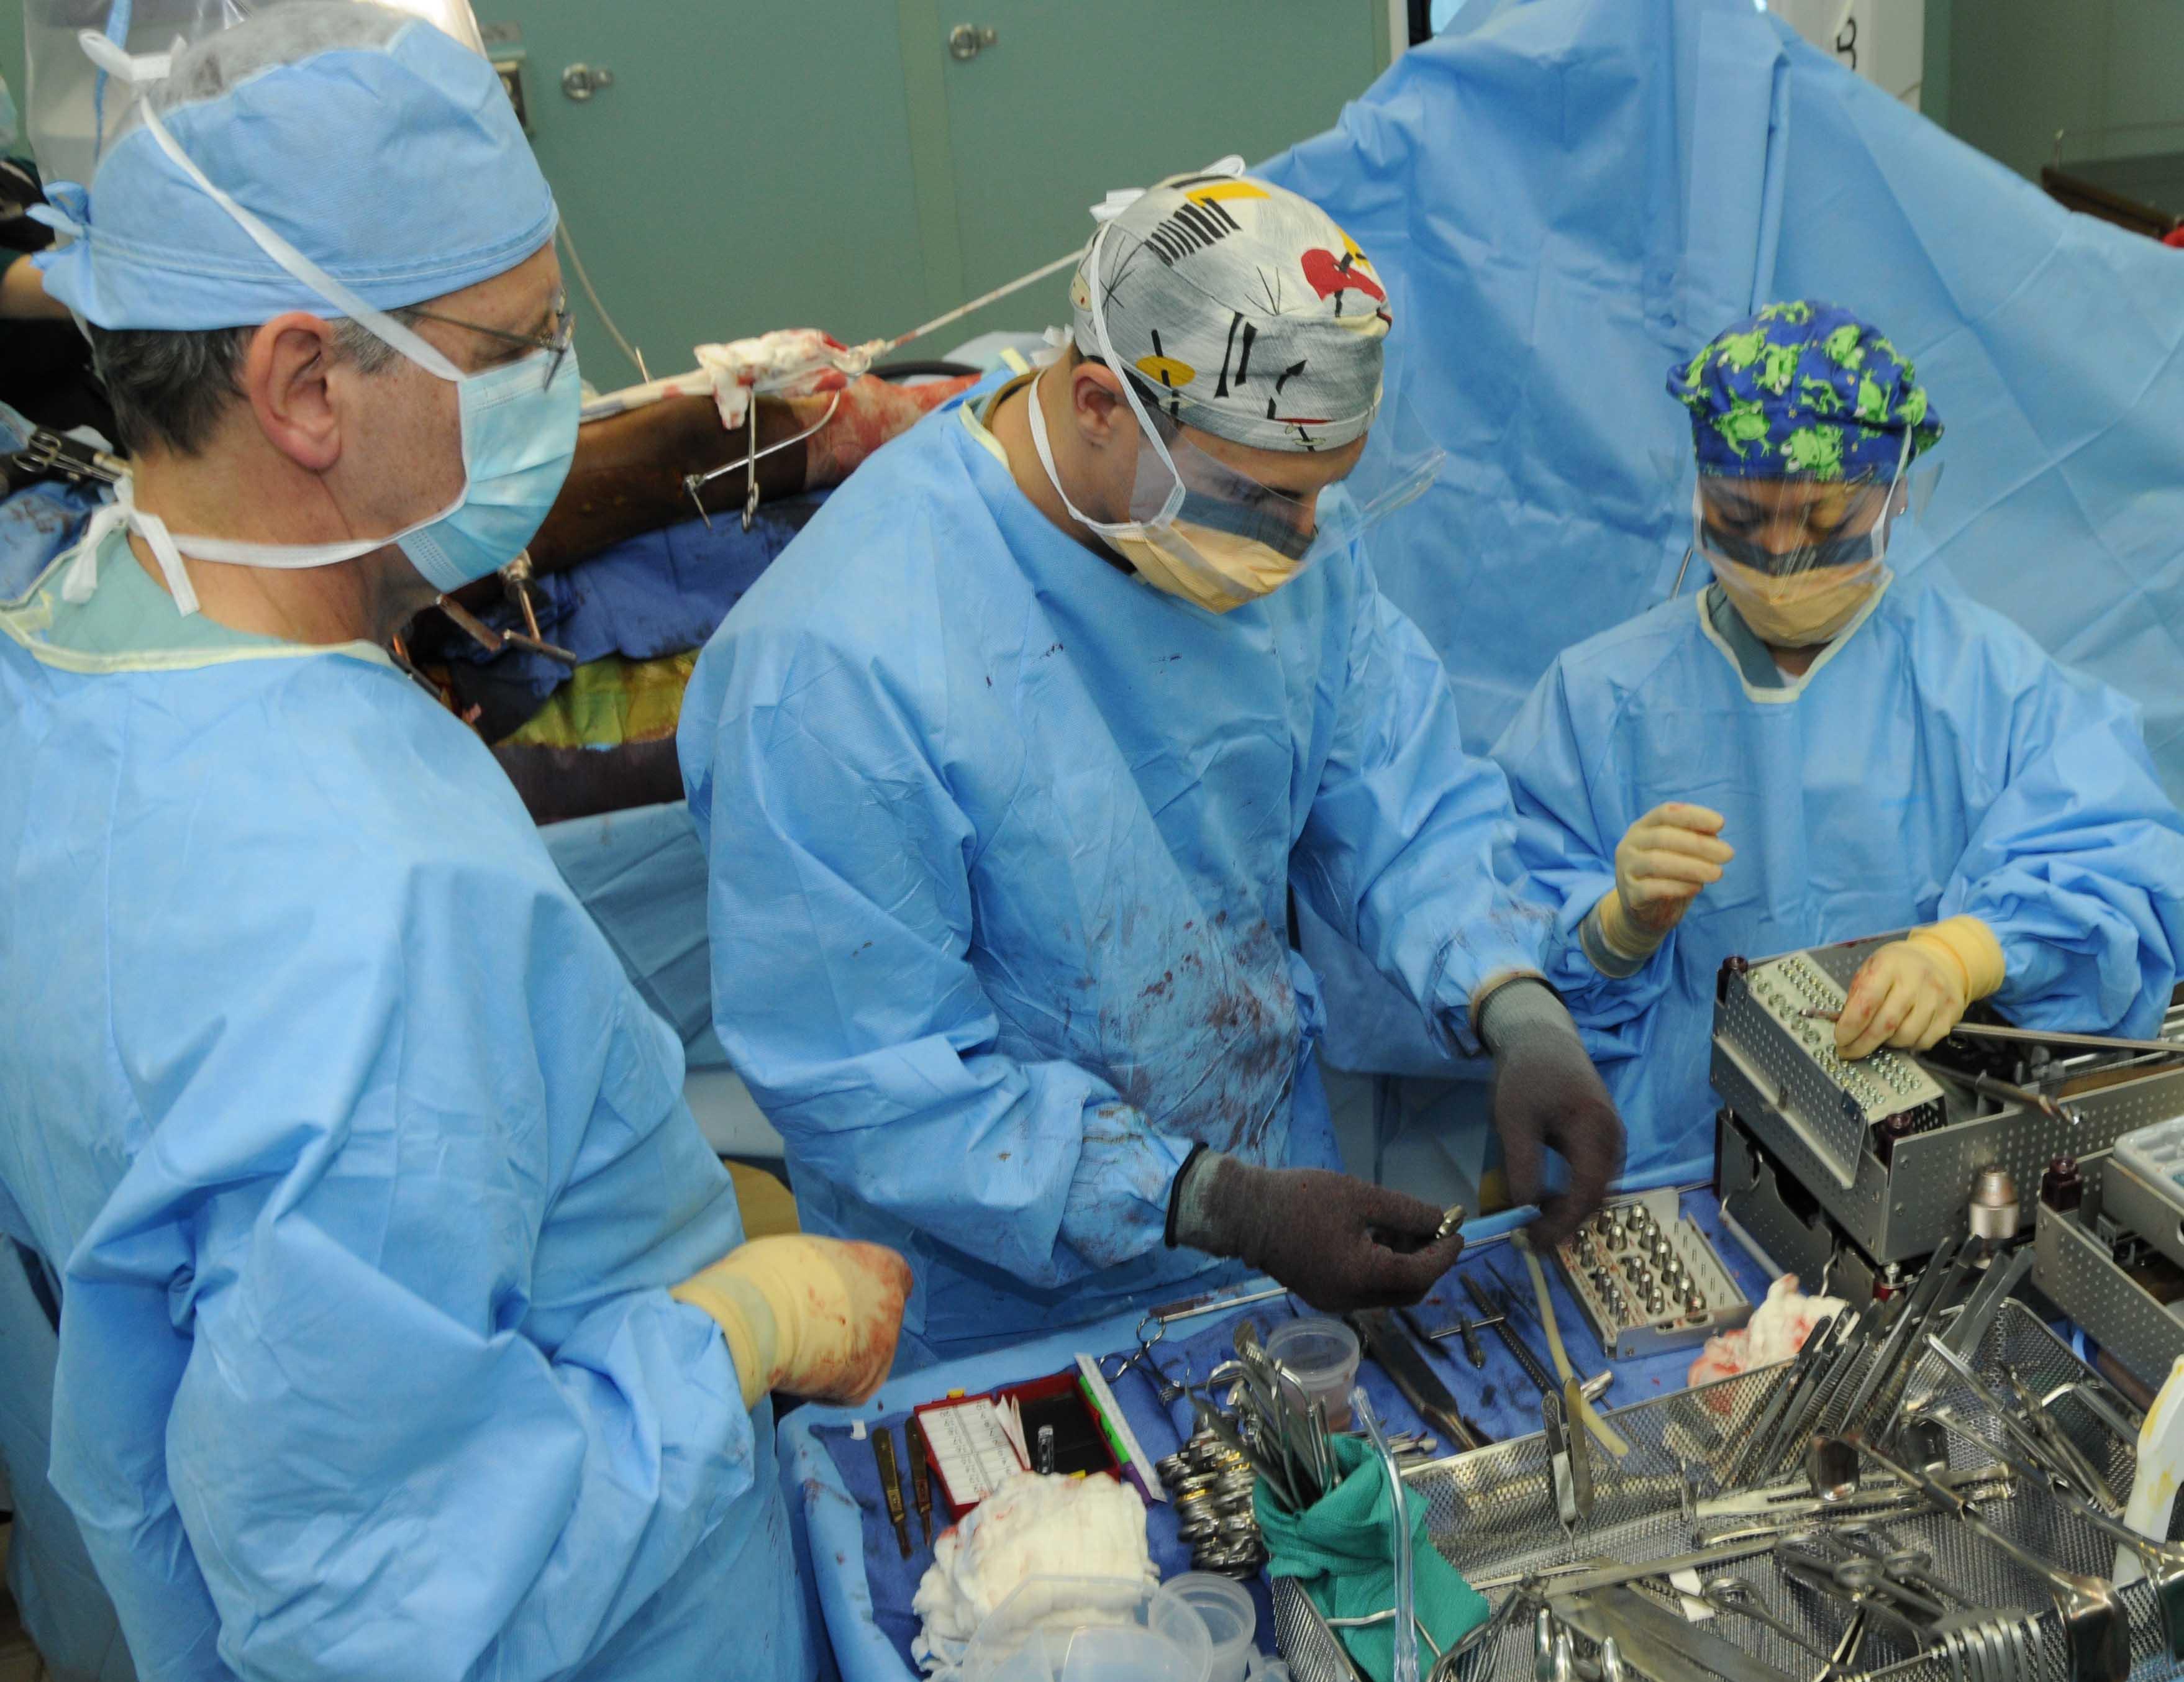 The Average American Surgical Tech Salary – Surgical Tech Job Description